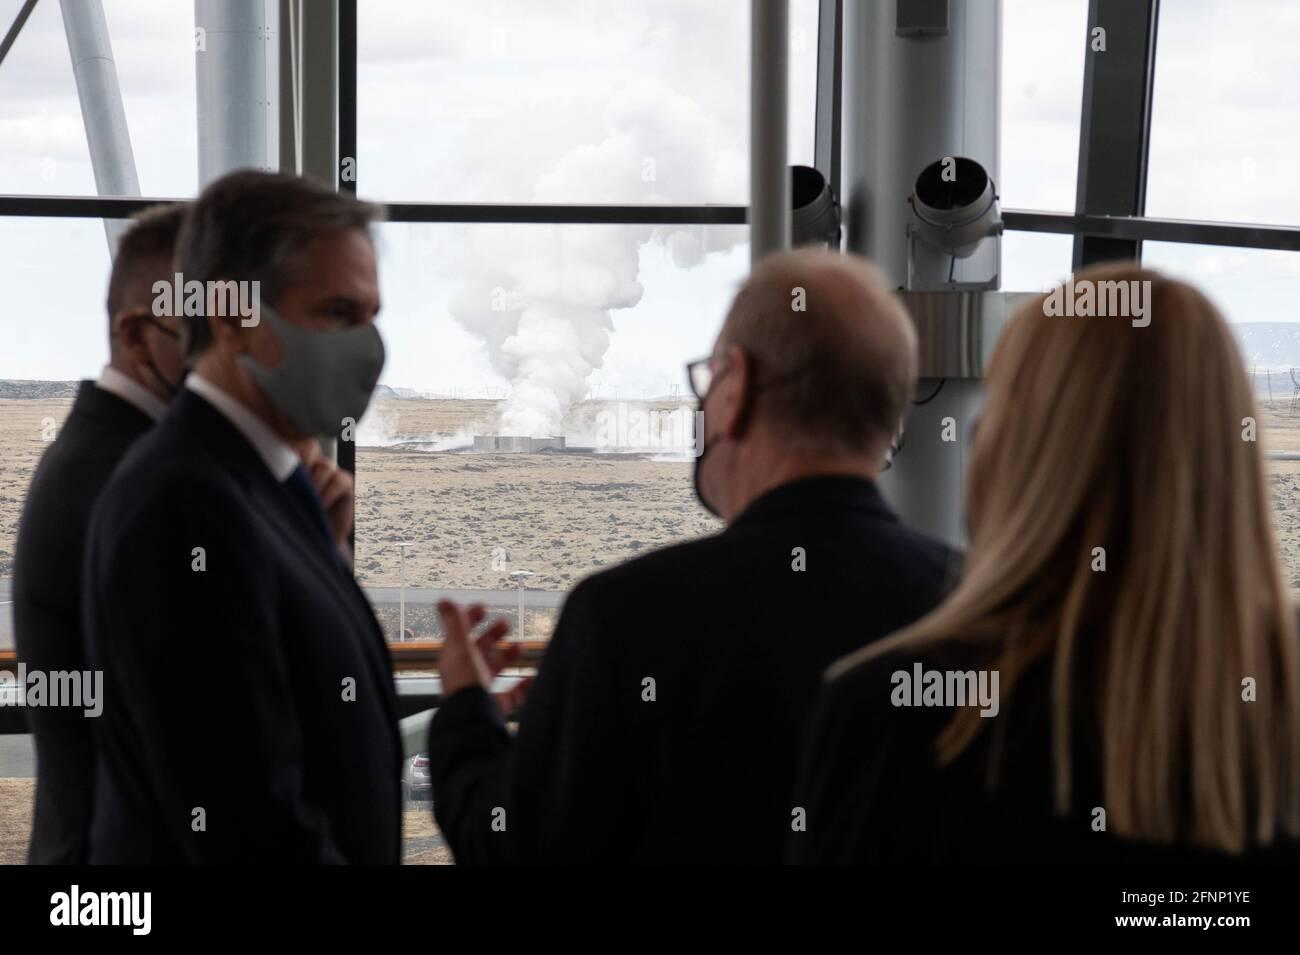 U.S. Secretary of State Antony Blinken speaks with CEO of Reykjavik Energy Bjarni Bjarnason during a tour to the Hellisheidi Geothermal Plant, in Hengill, Iceland May 18, 2021. Saul Loeb/Pool via REUTERS Stock Photo